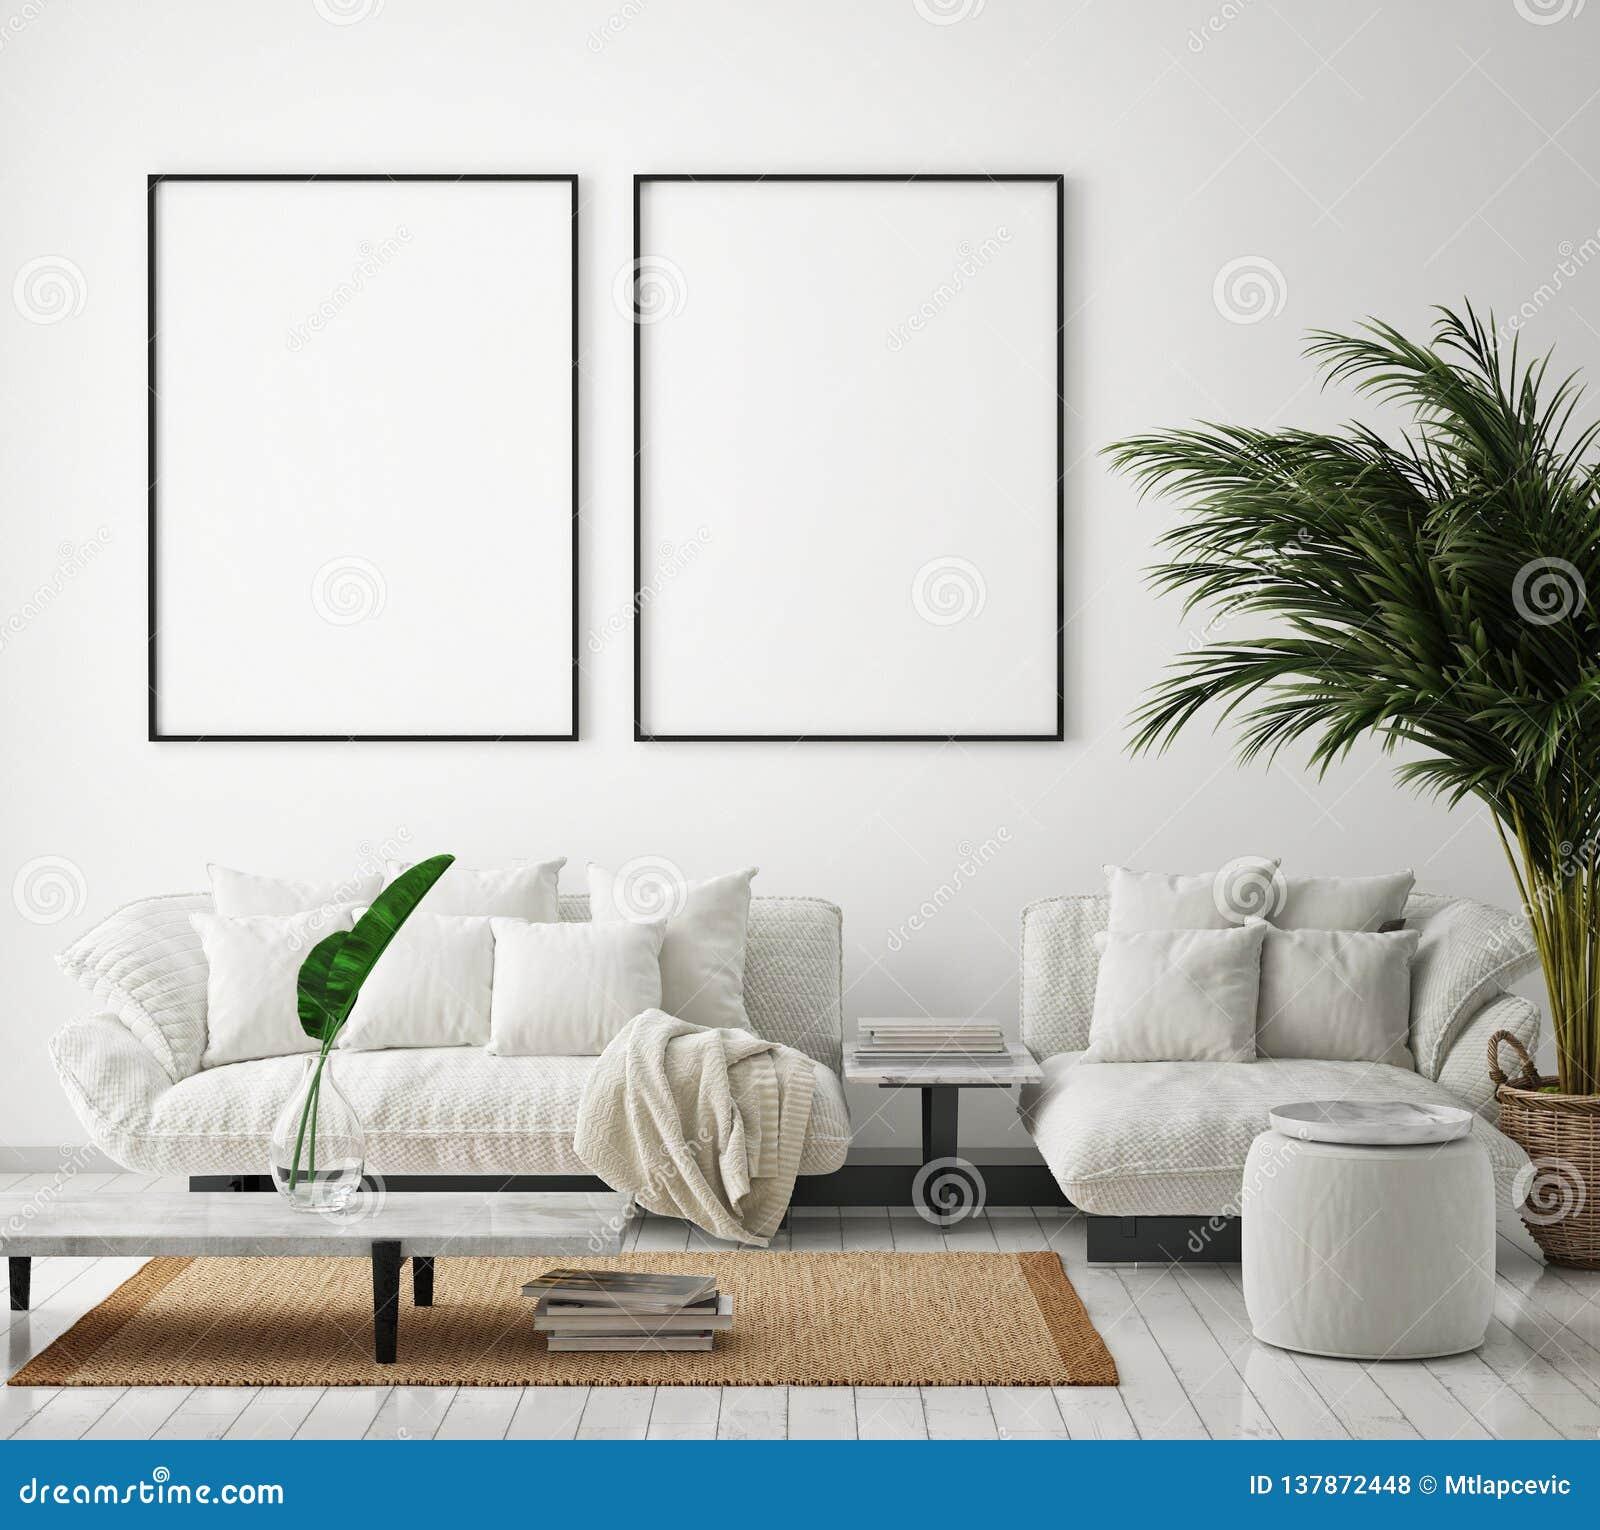 Mock Up Poster Frame In Modern Interior Background Living Room Scandinavian Style 3d Render Stock Illustration Illustration Of Black Creative 137872448